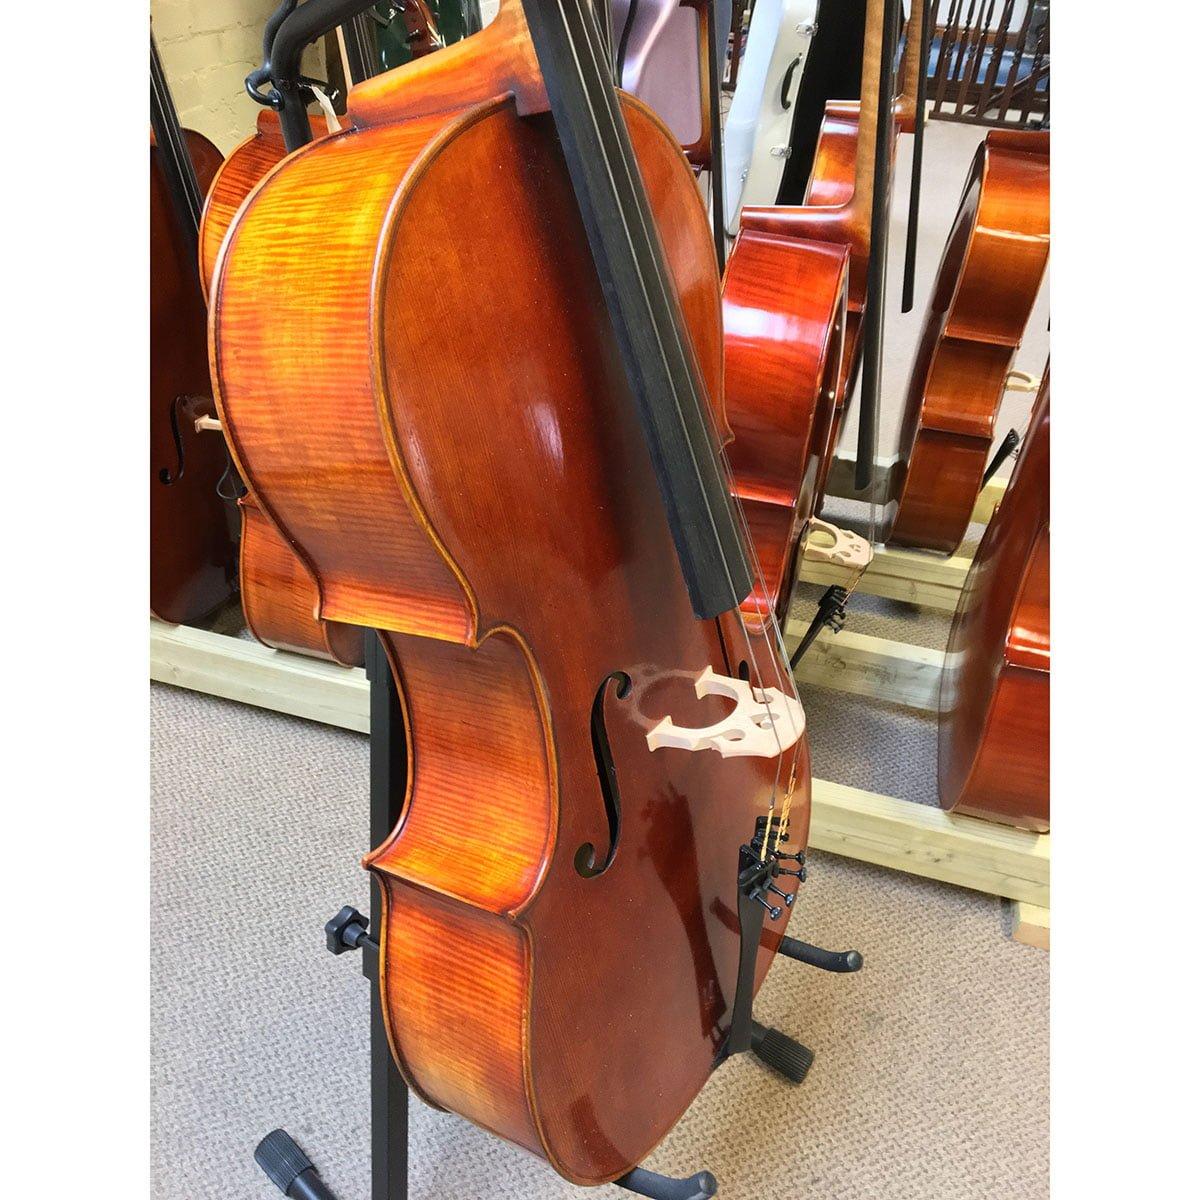 Jay Haide Vuillaume Cello Bass Bags